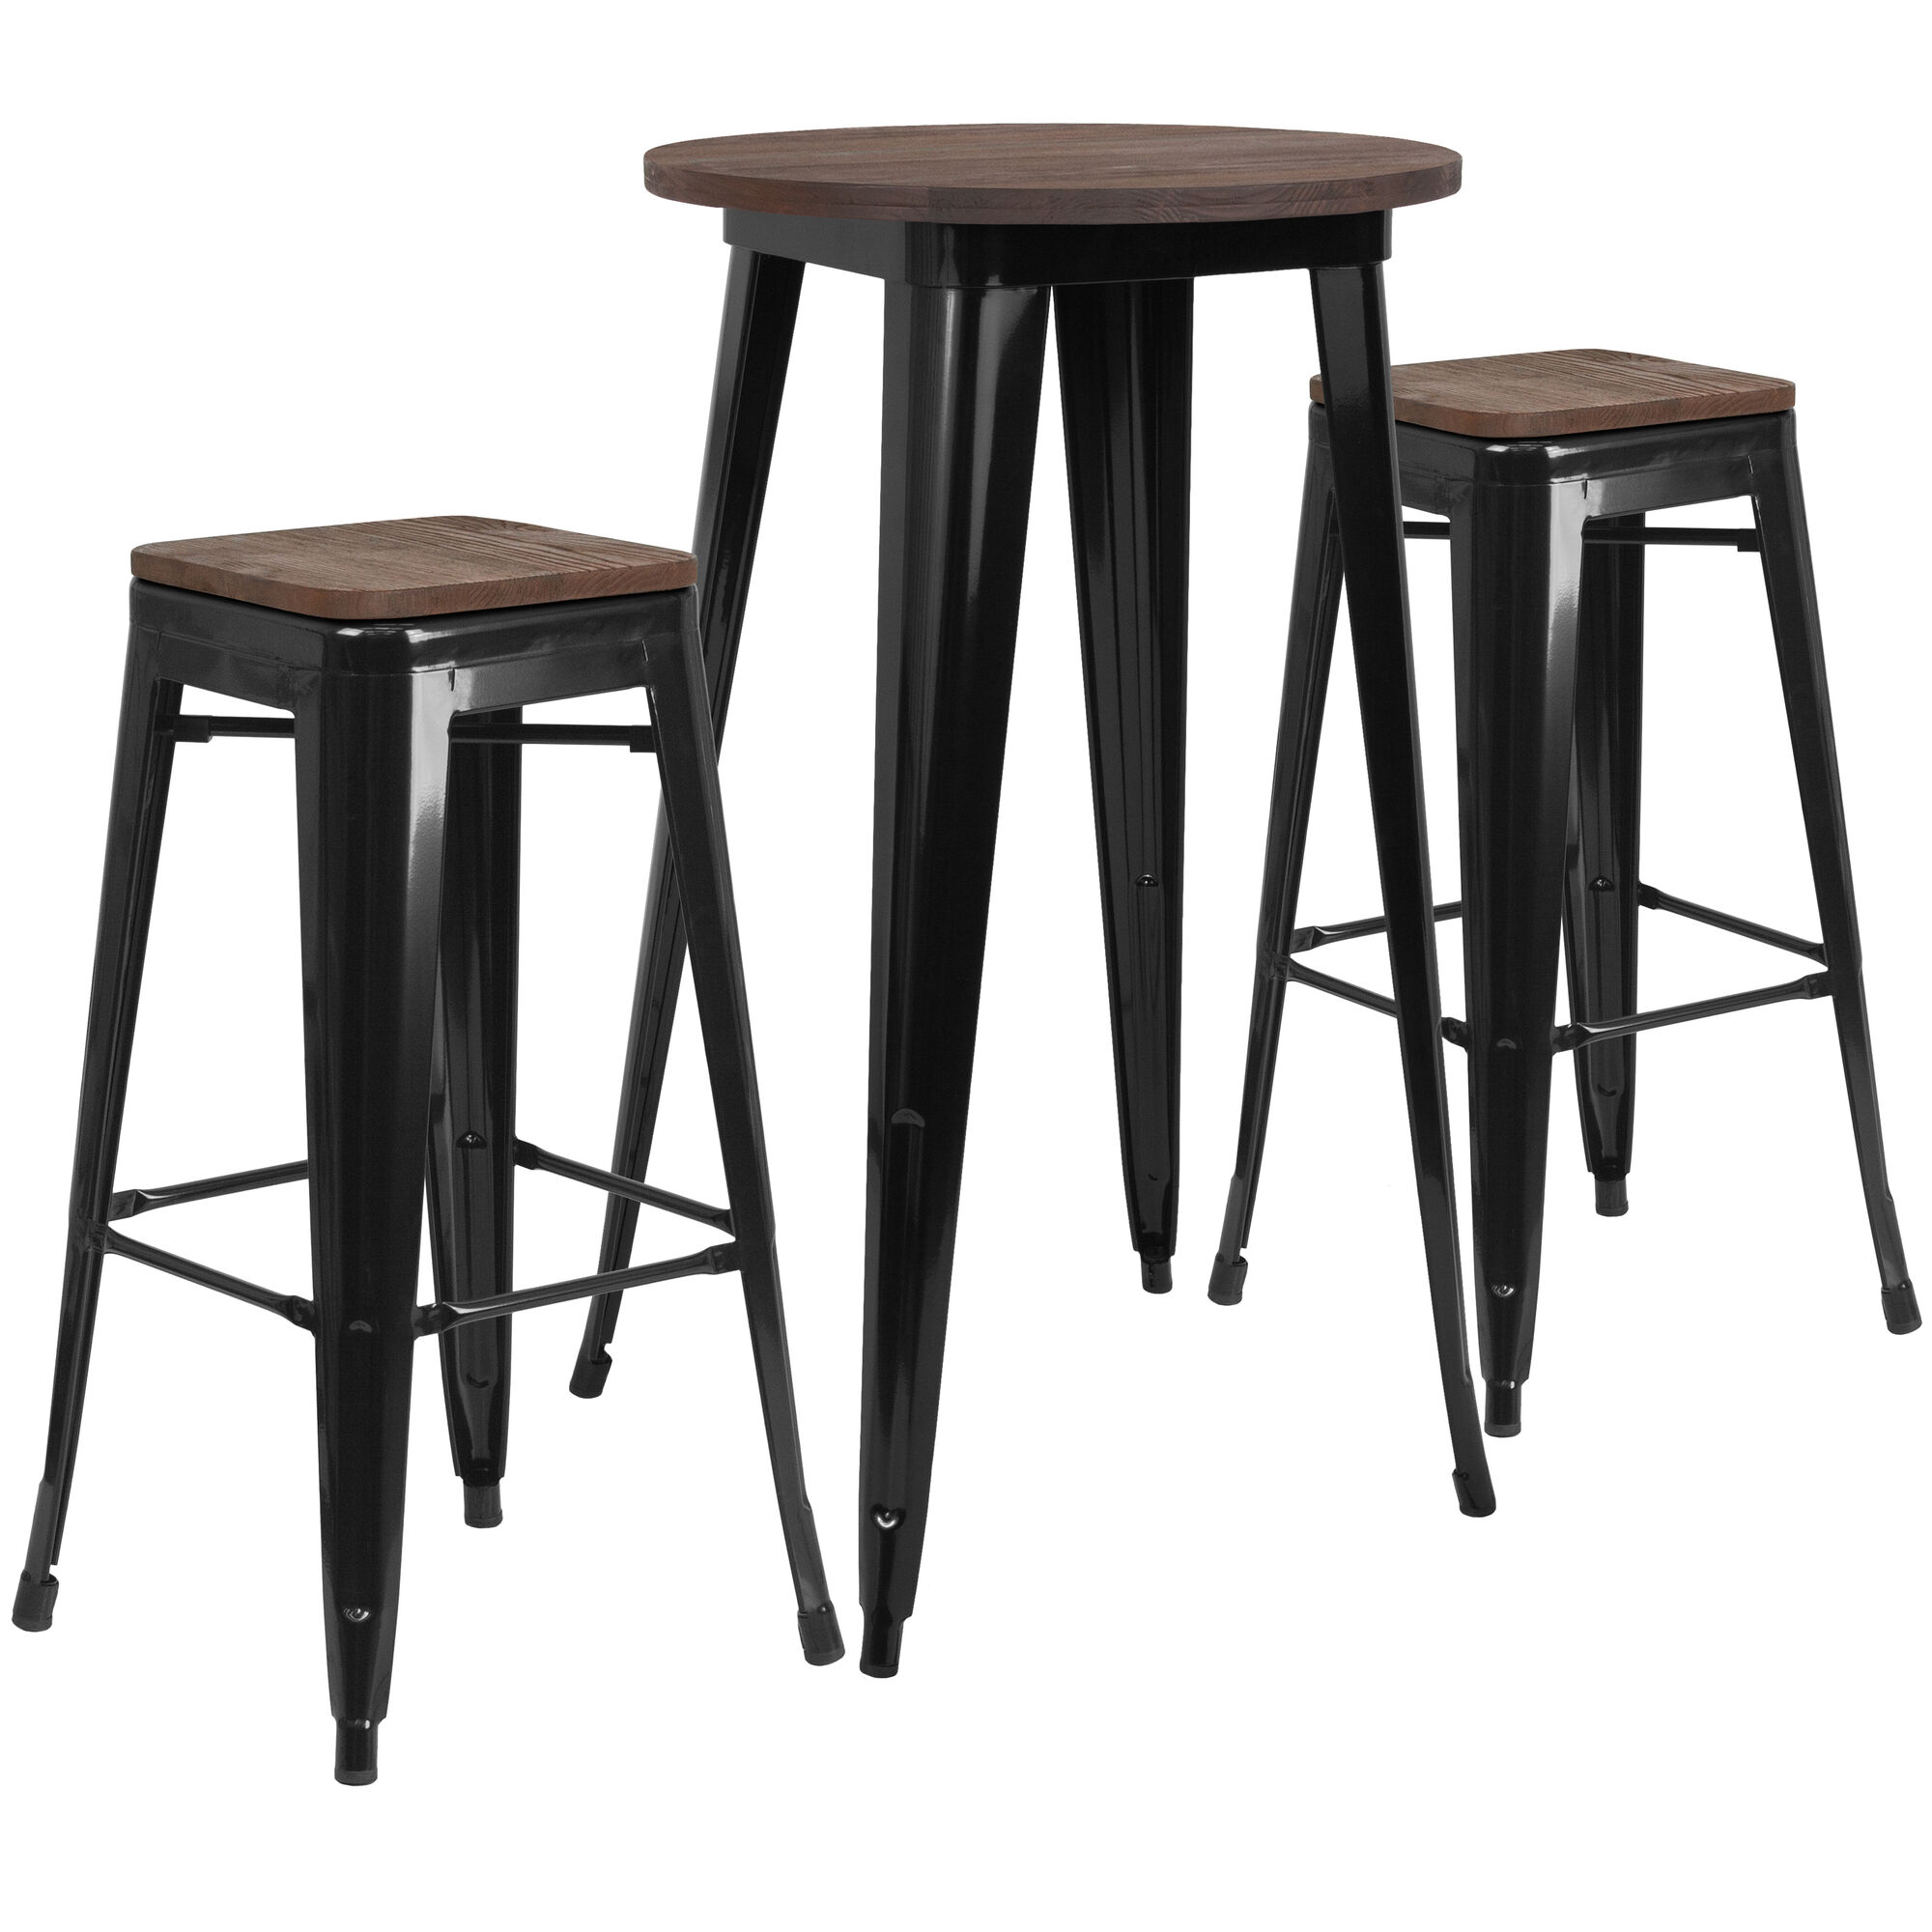 Wood Top Metal Bar Stools